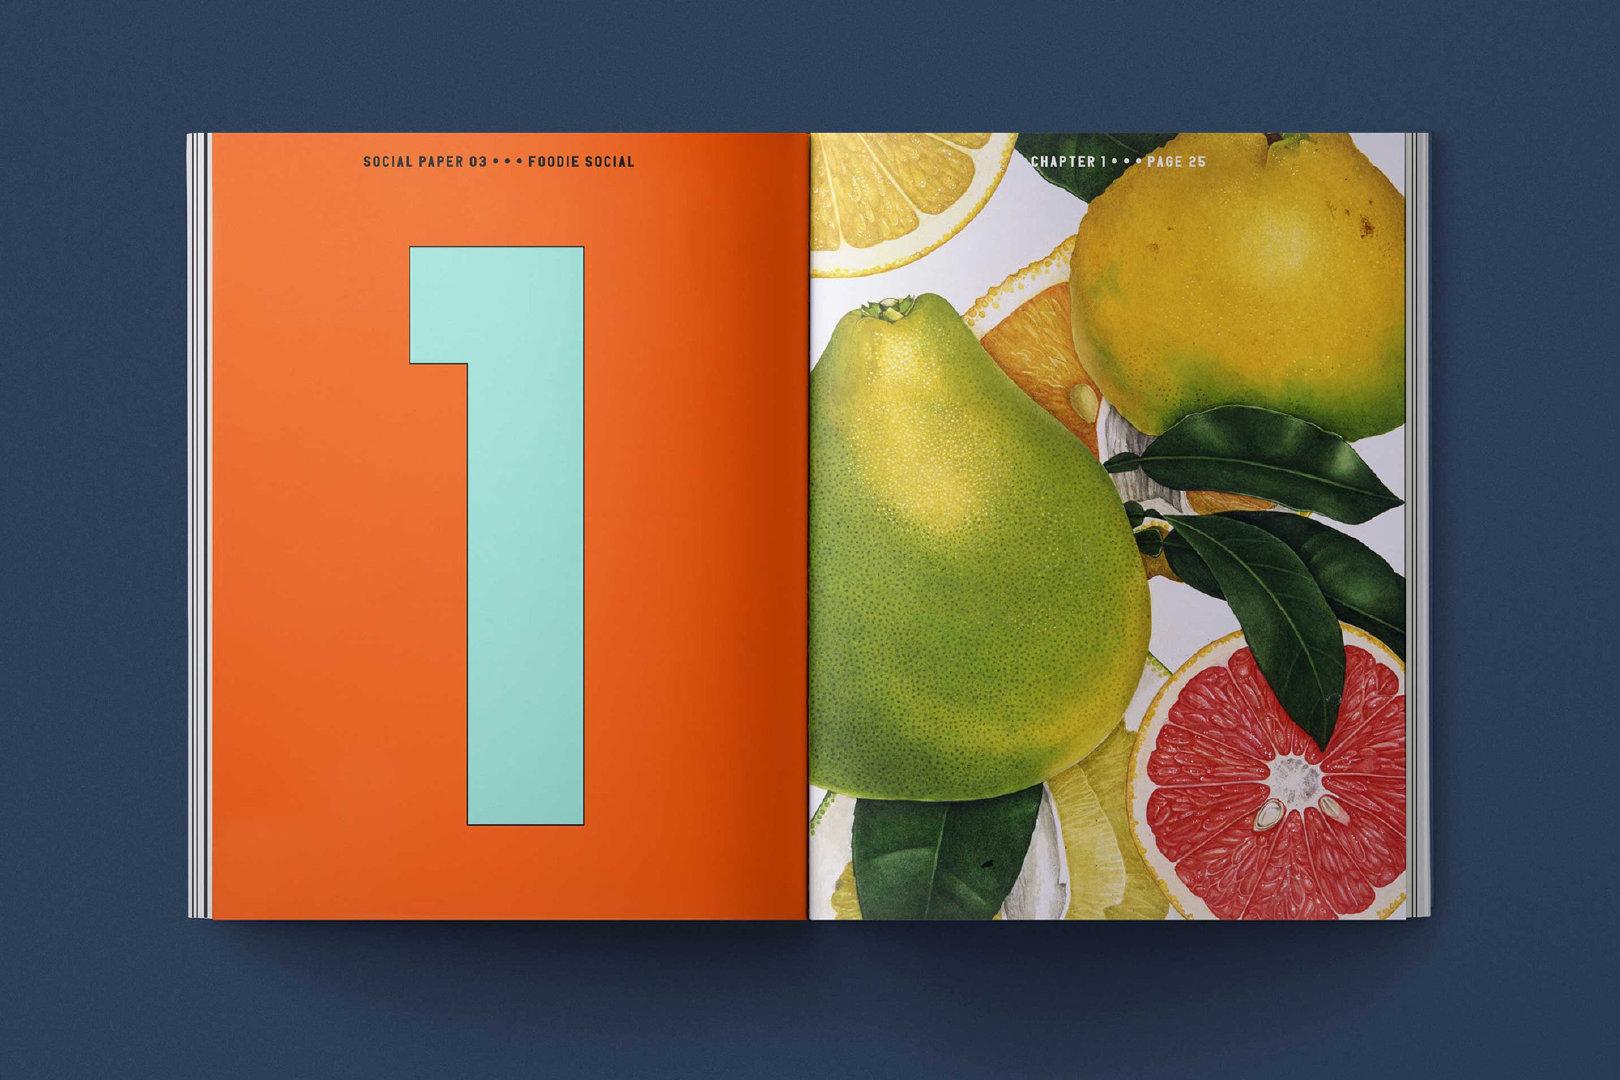 《Social Paper》是一本由新天地发起、重新发掘社群价值的杂志书